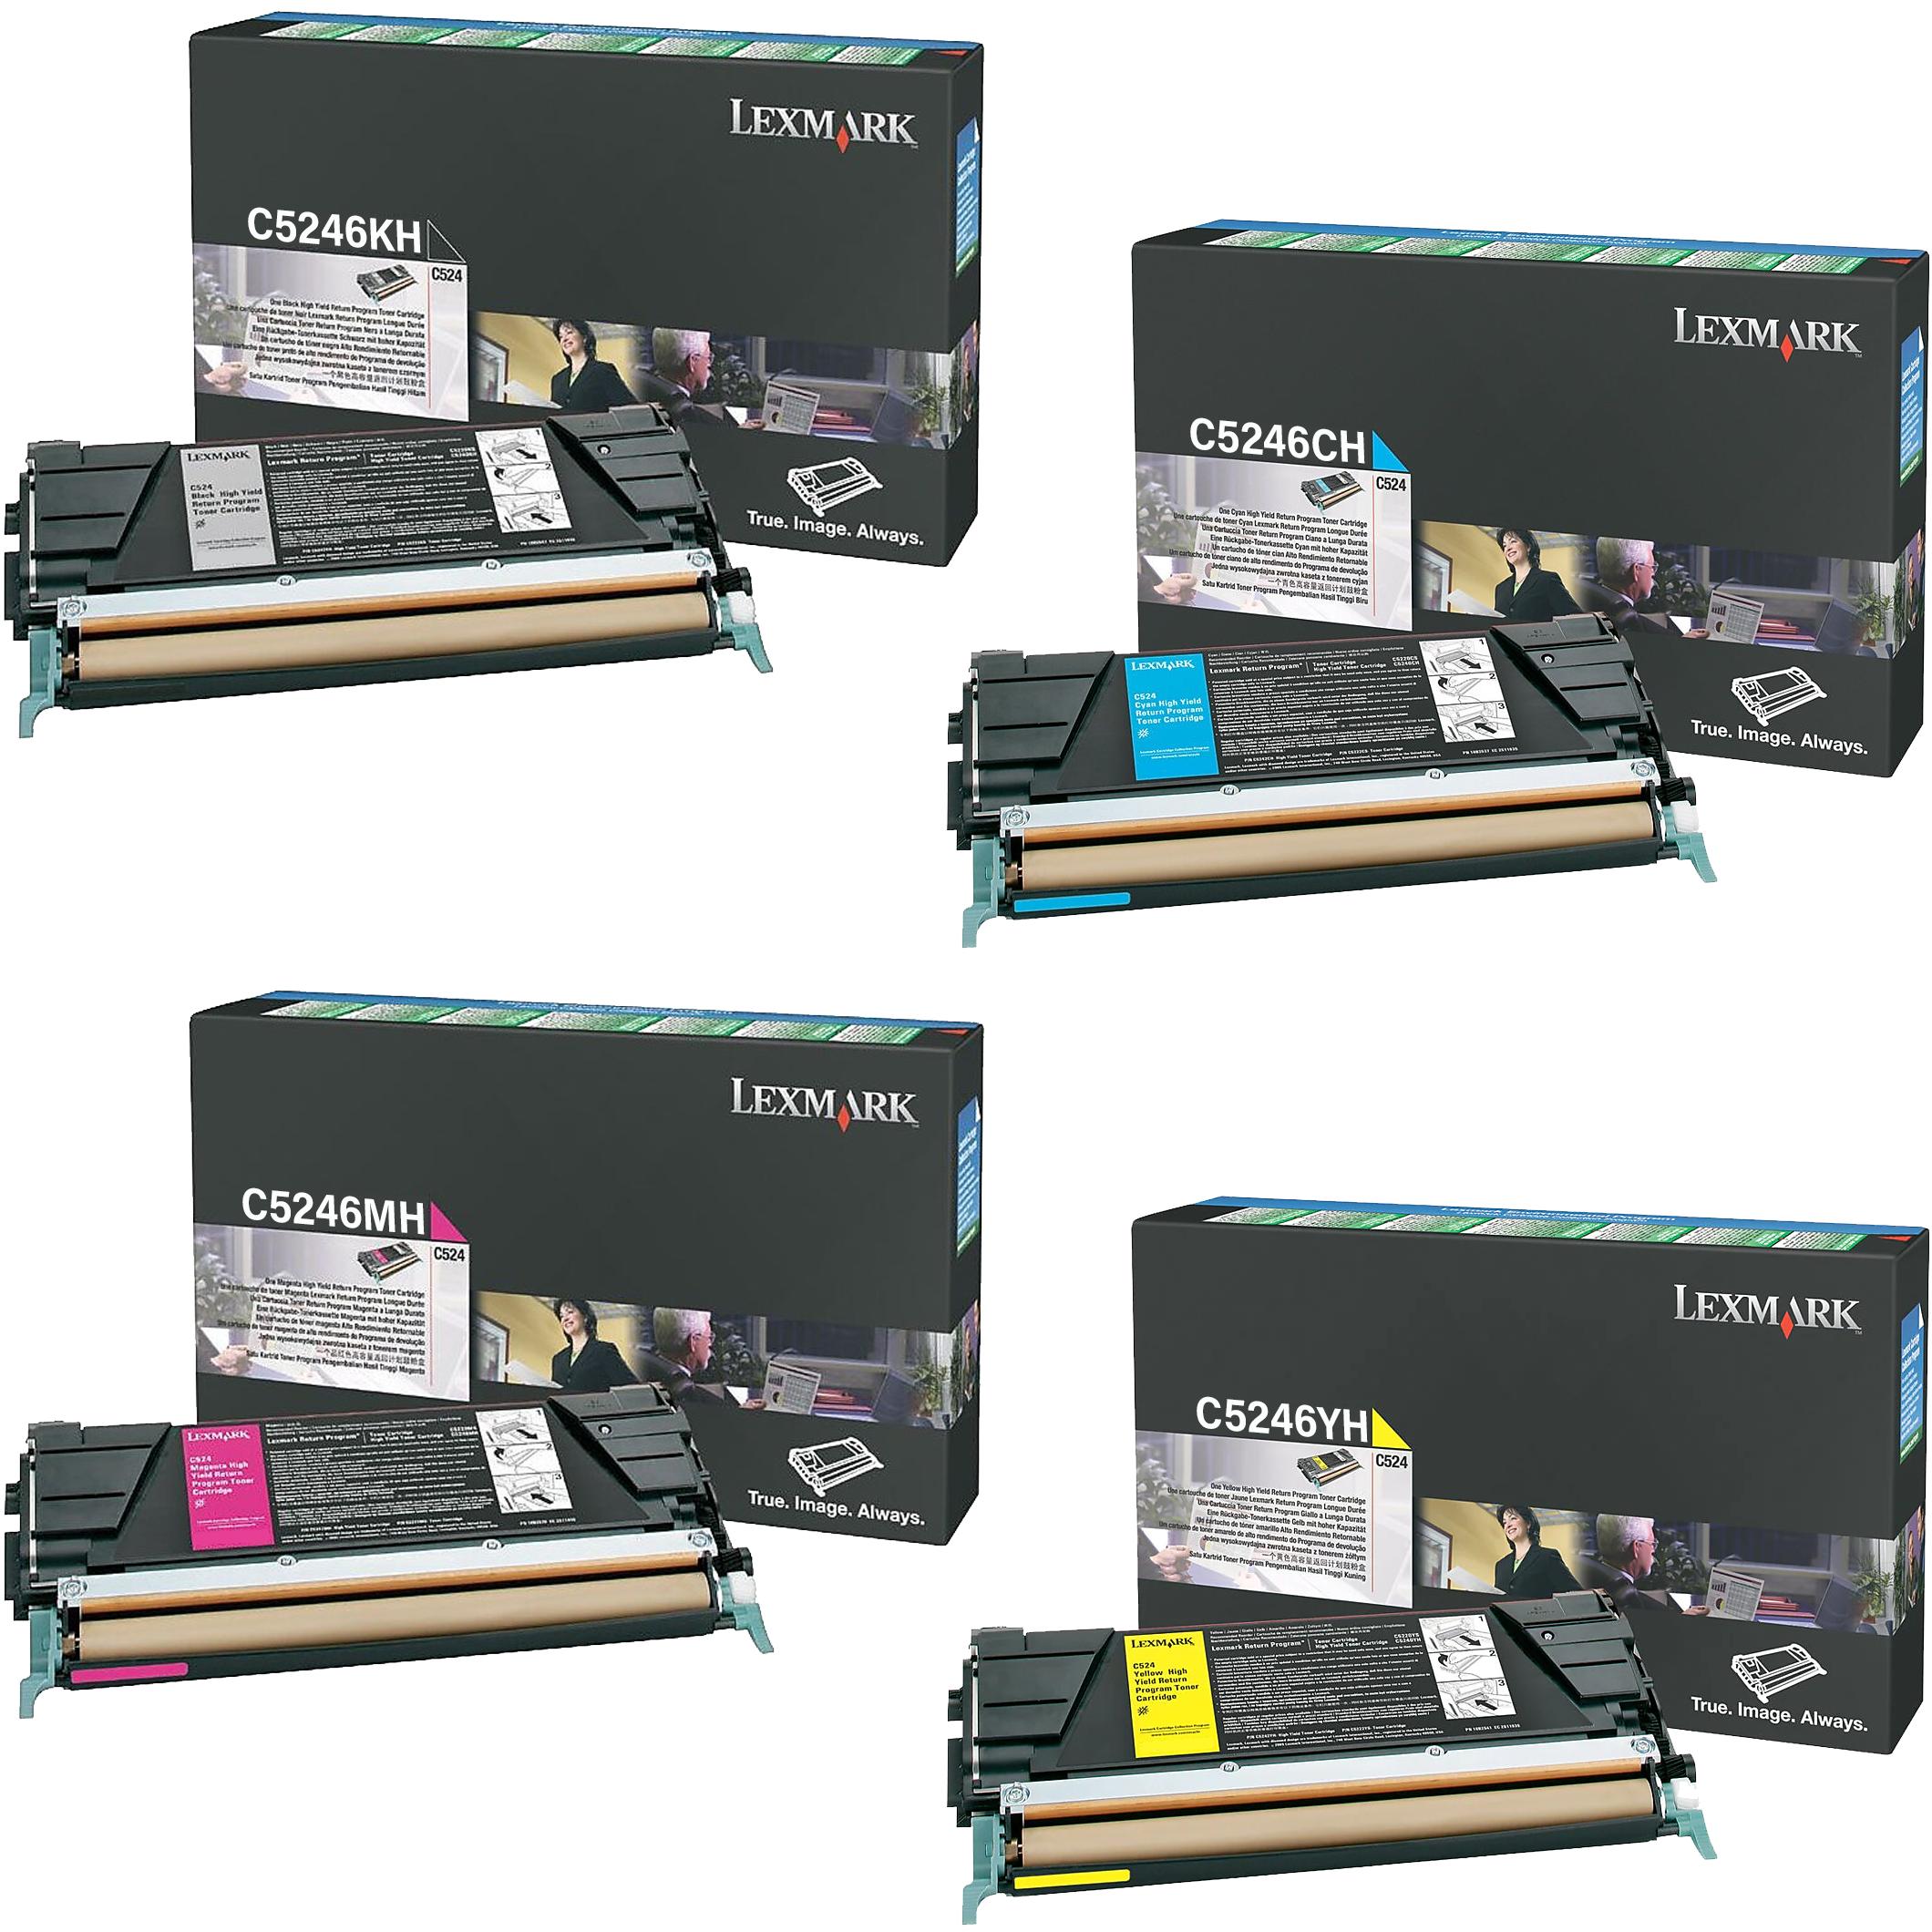 Lexmark C5246 Set   C5246CH C5246KH C5246MH C5246YH   Original Lexmark High-Yield Toner Cartridges – Black, Cyan, Magenta, Yellow